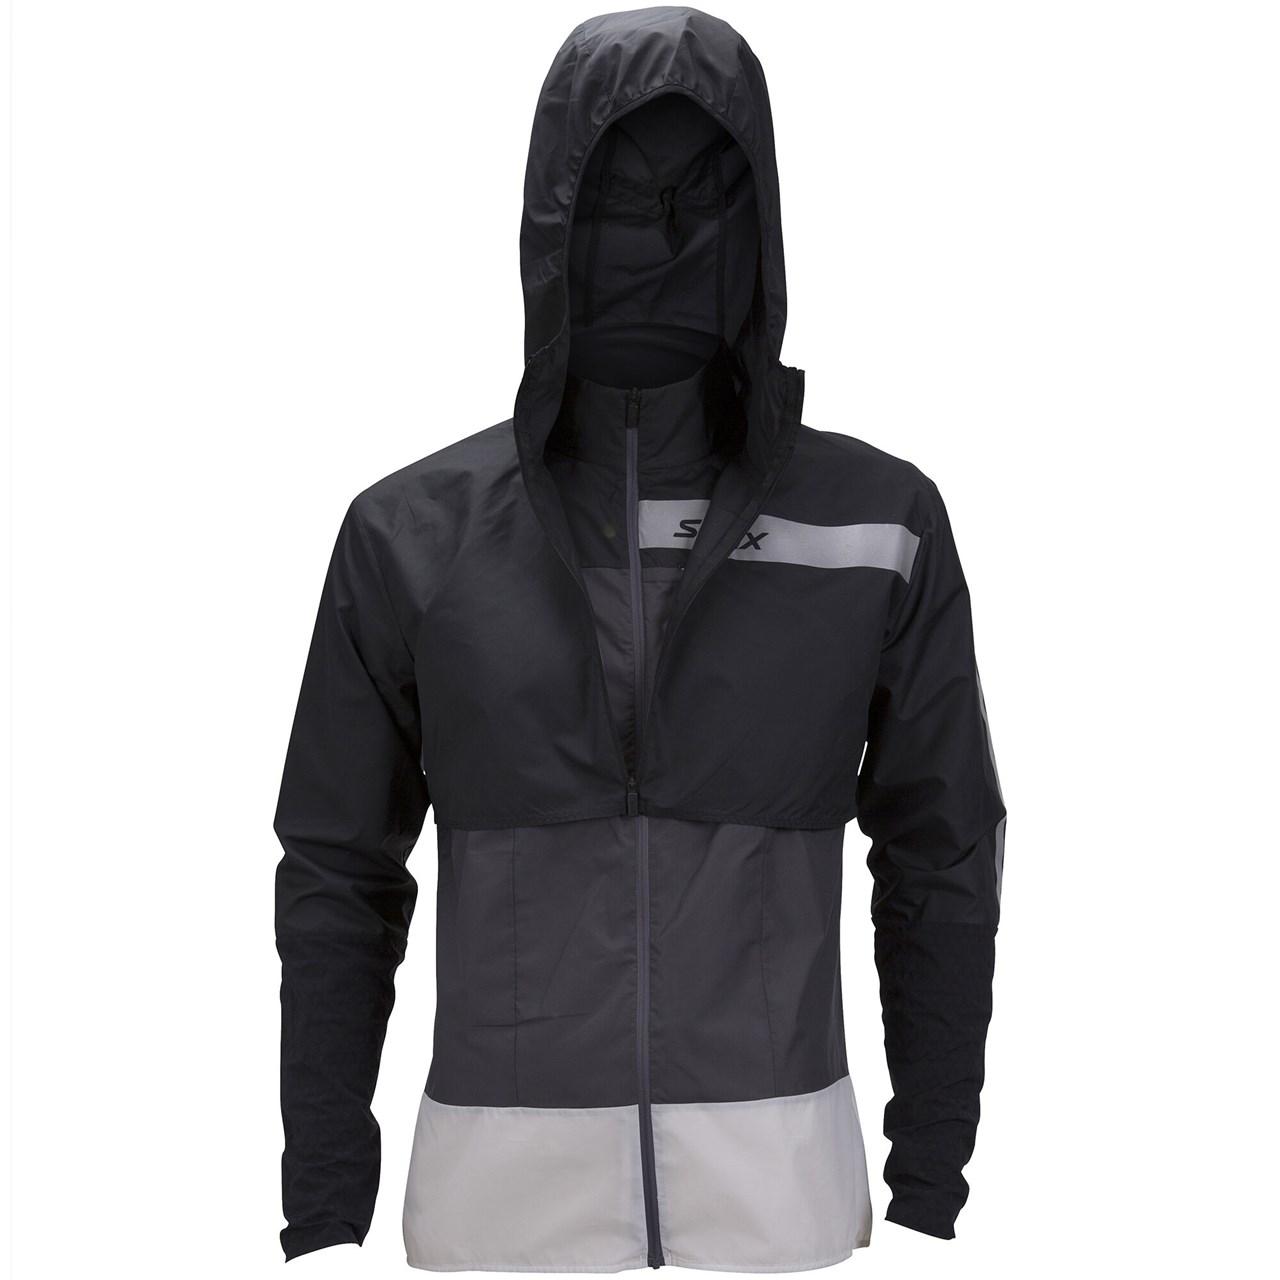 a151ab9c Swix Quest component jacket M – HETLAND SPORT SANDNES AS